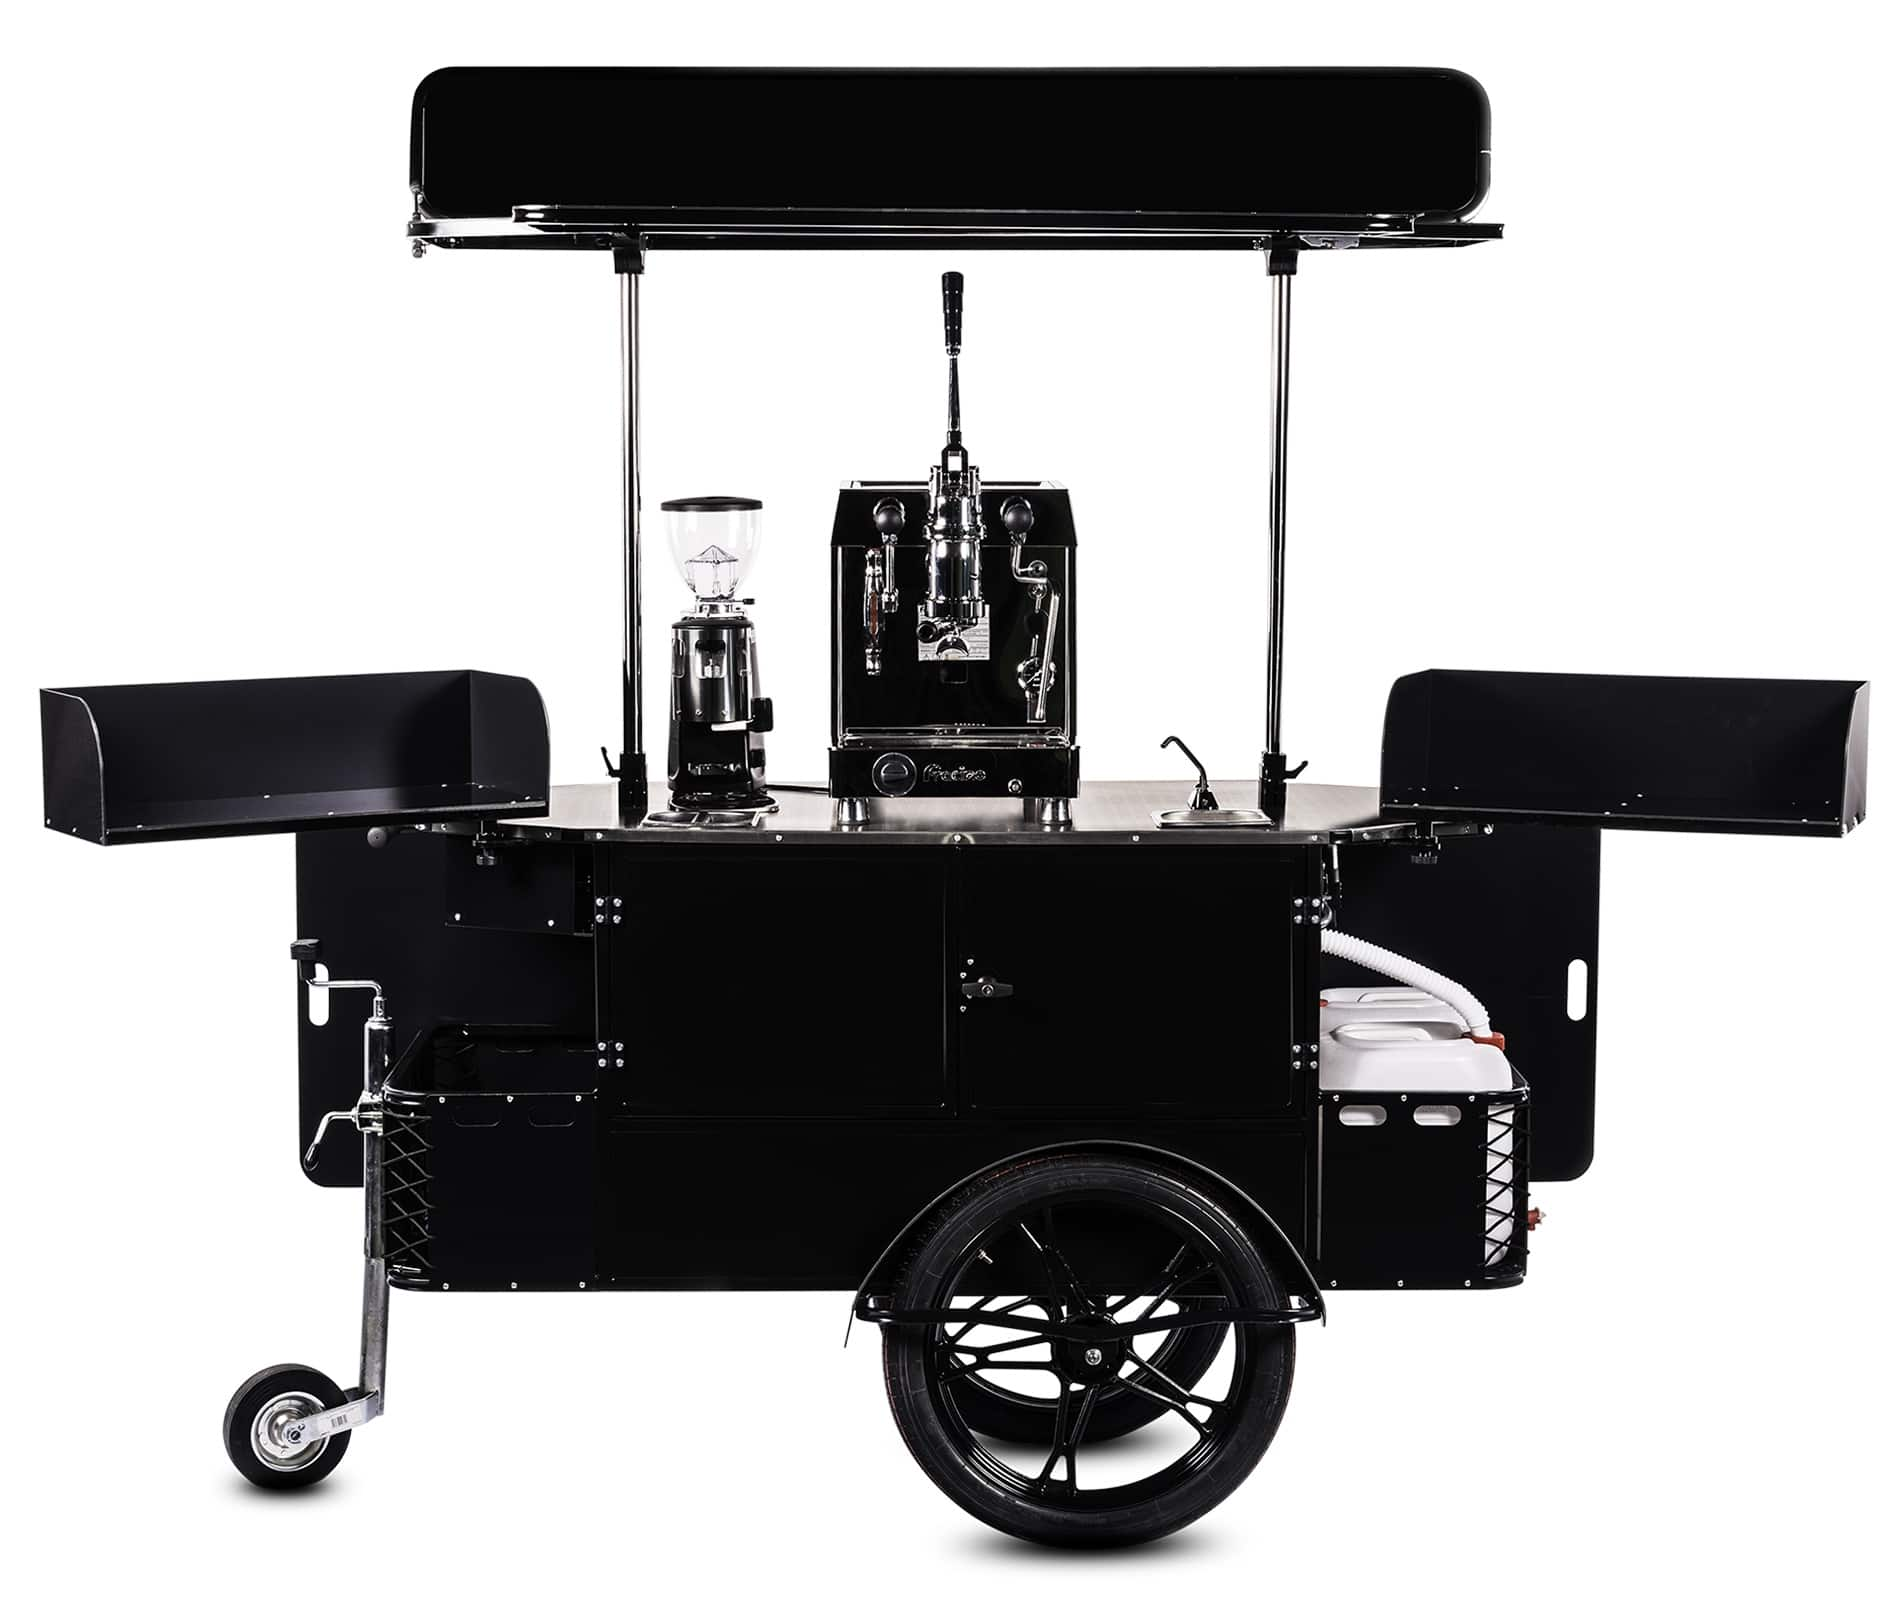 Bizz On Wheels premium coffee cart vendor side